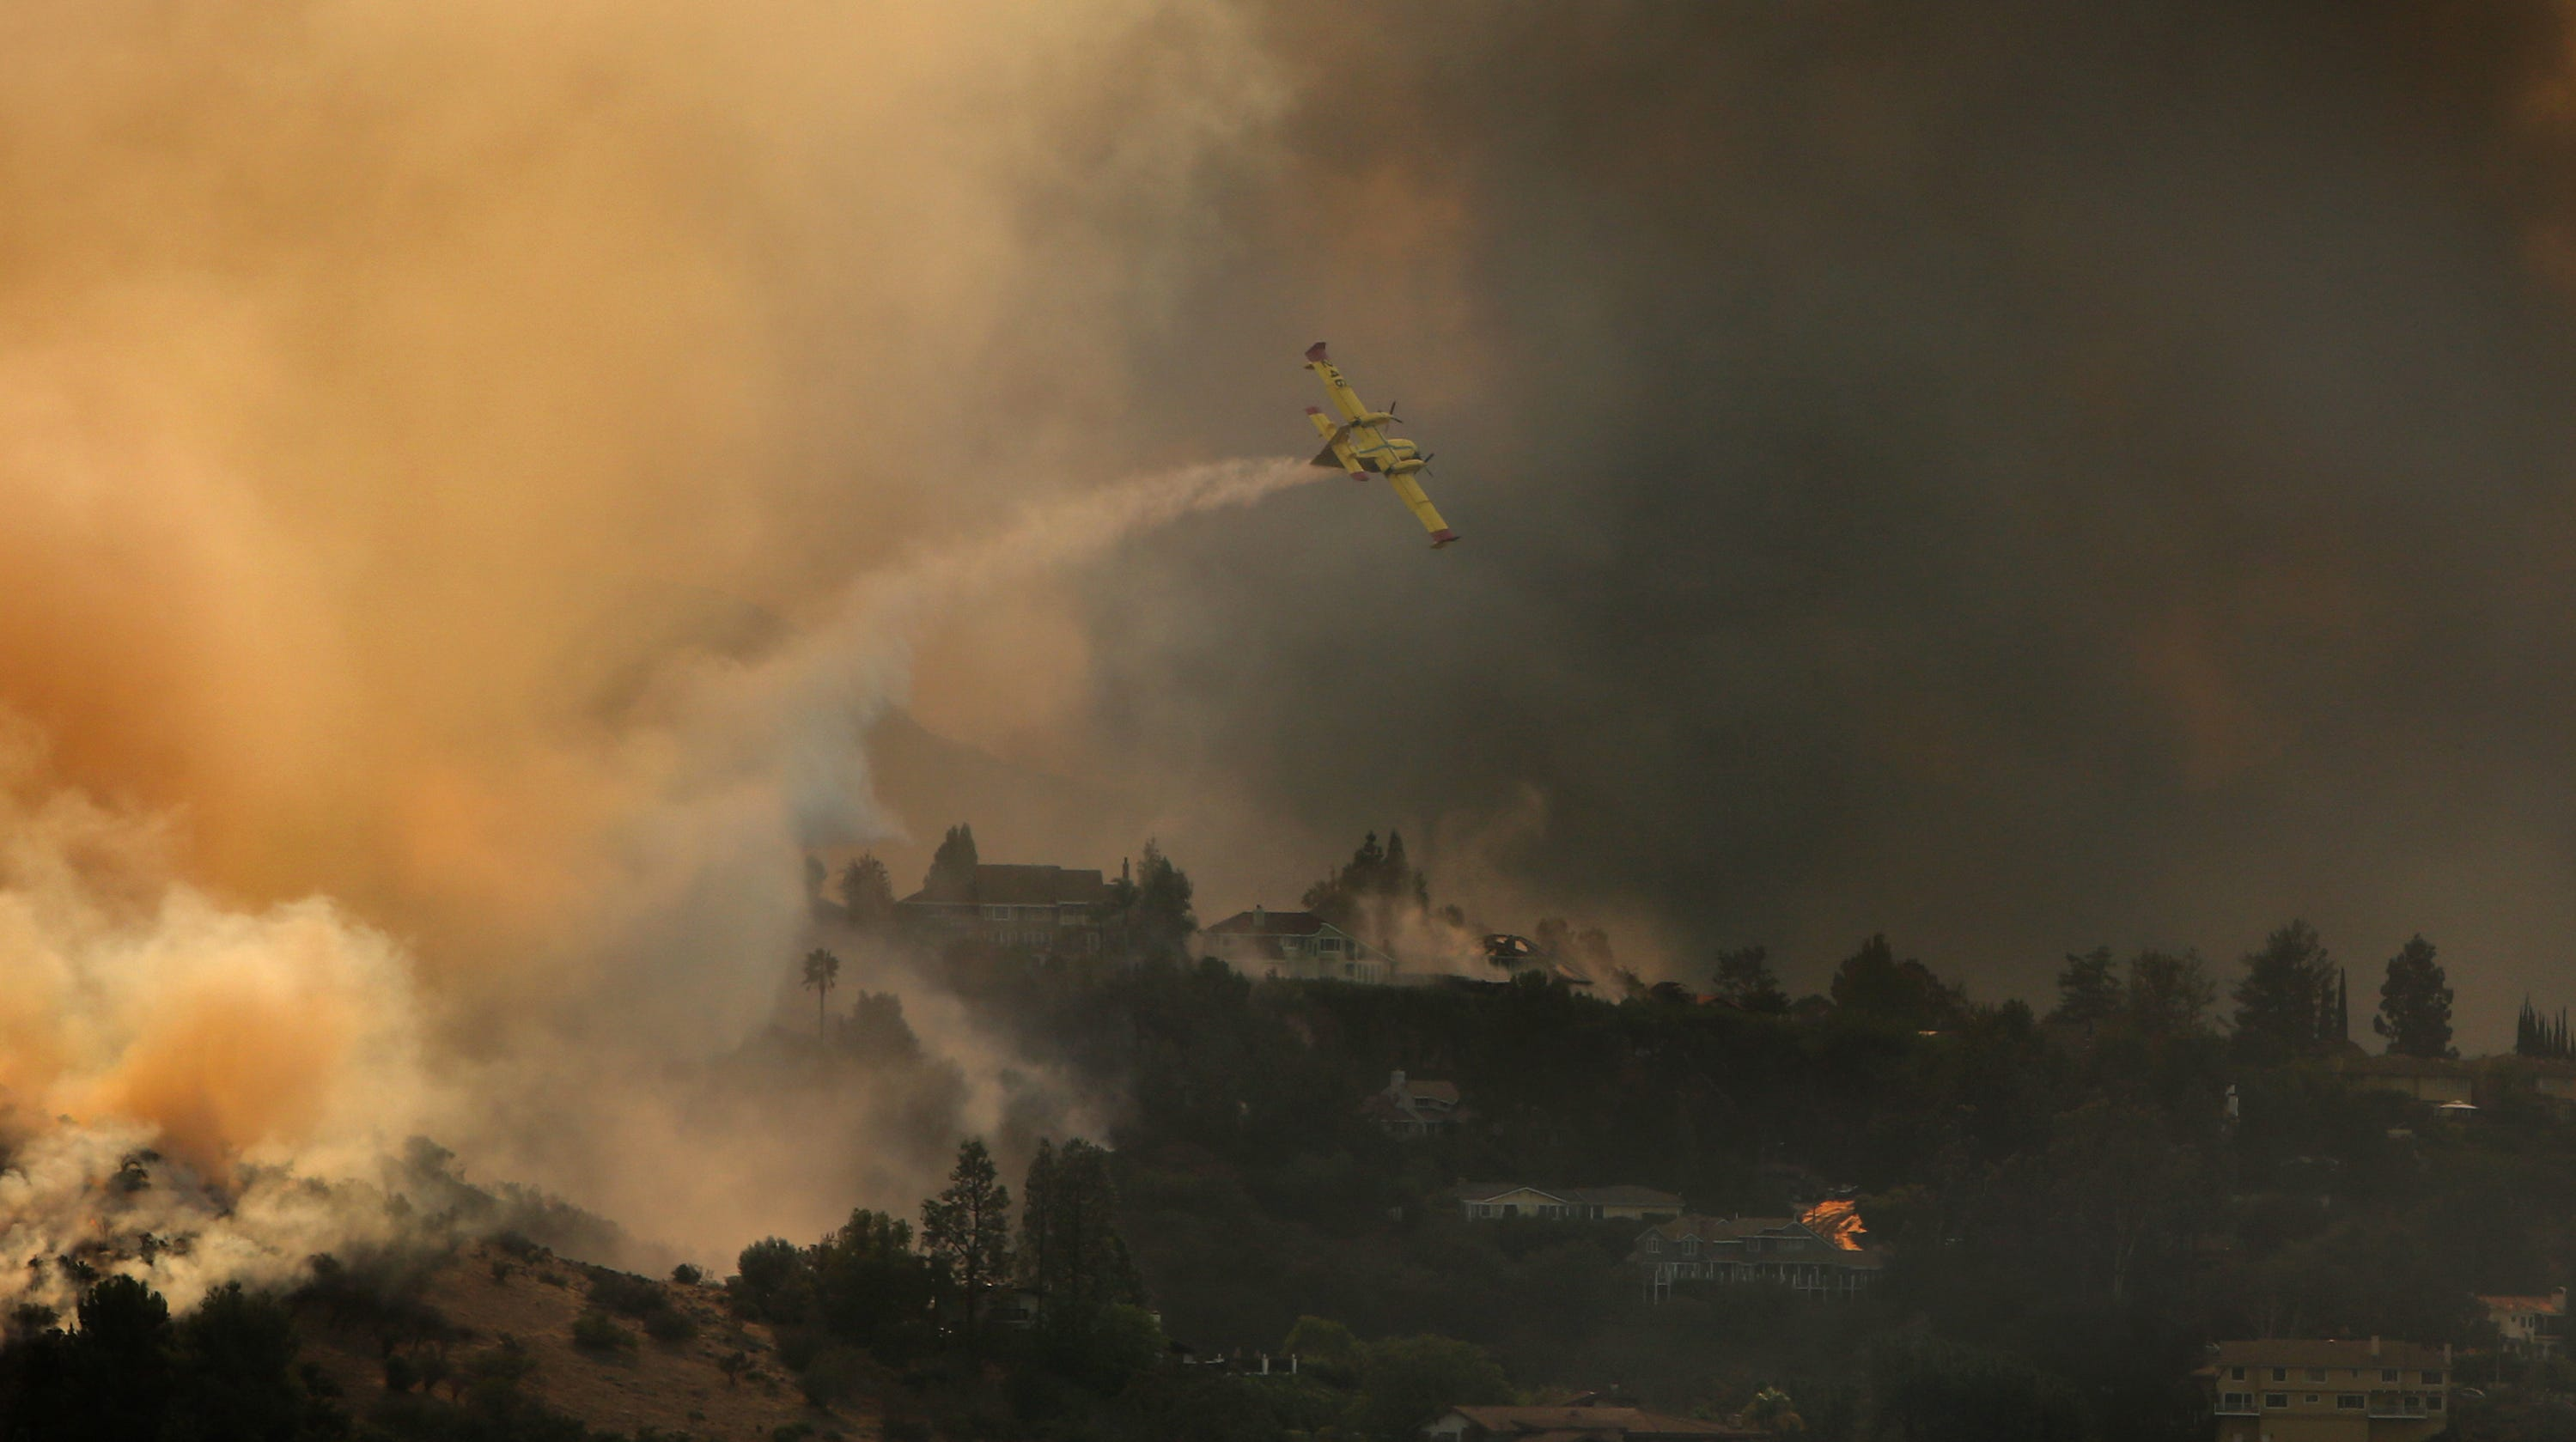 9793e58e-ef19-416c-8906-eab3a0ffad90-woolsey_fire_day_2_09